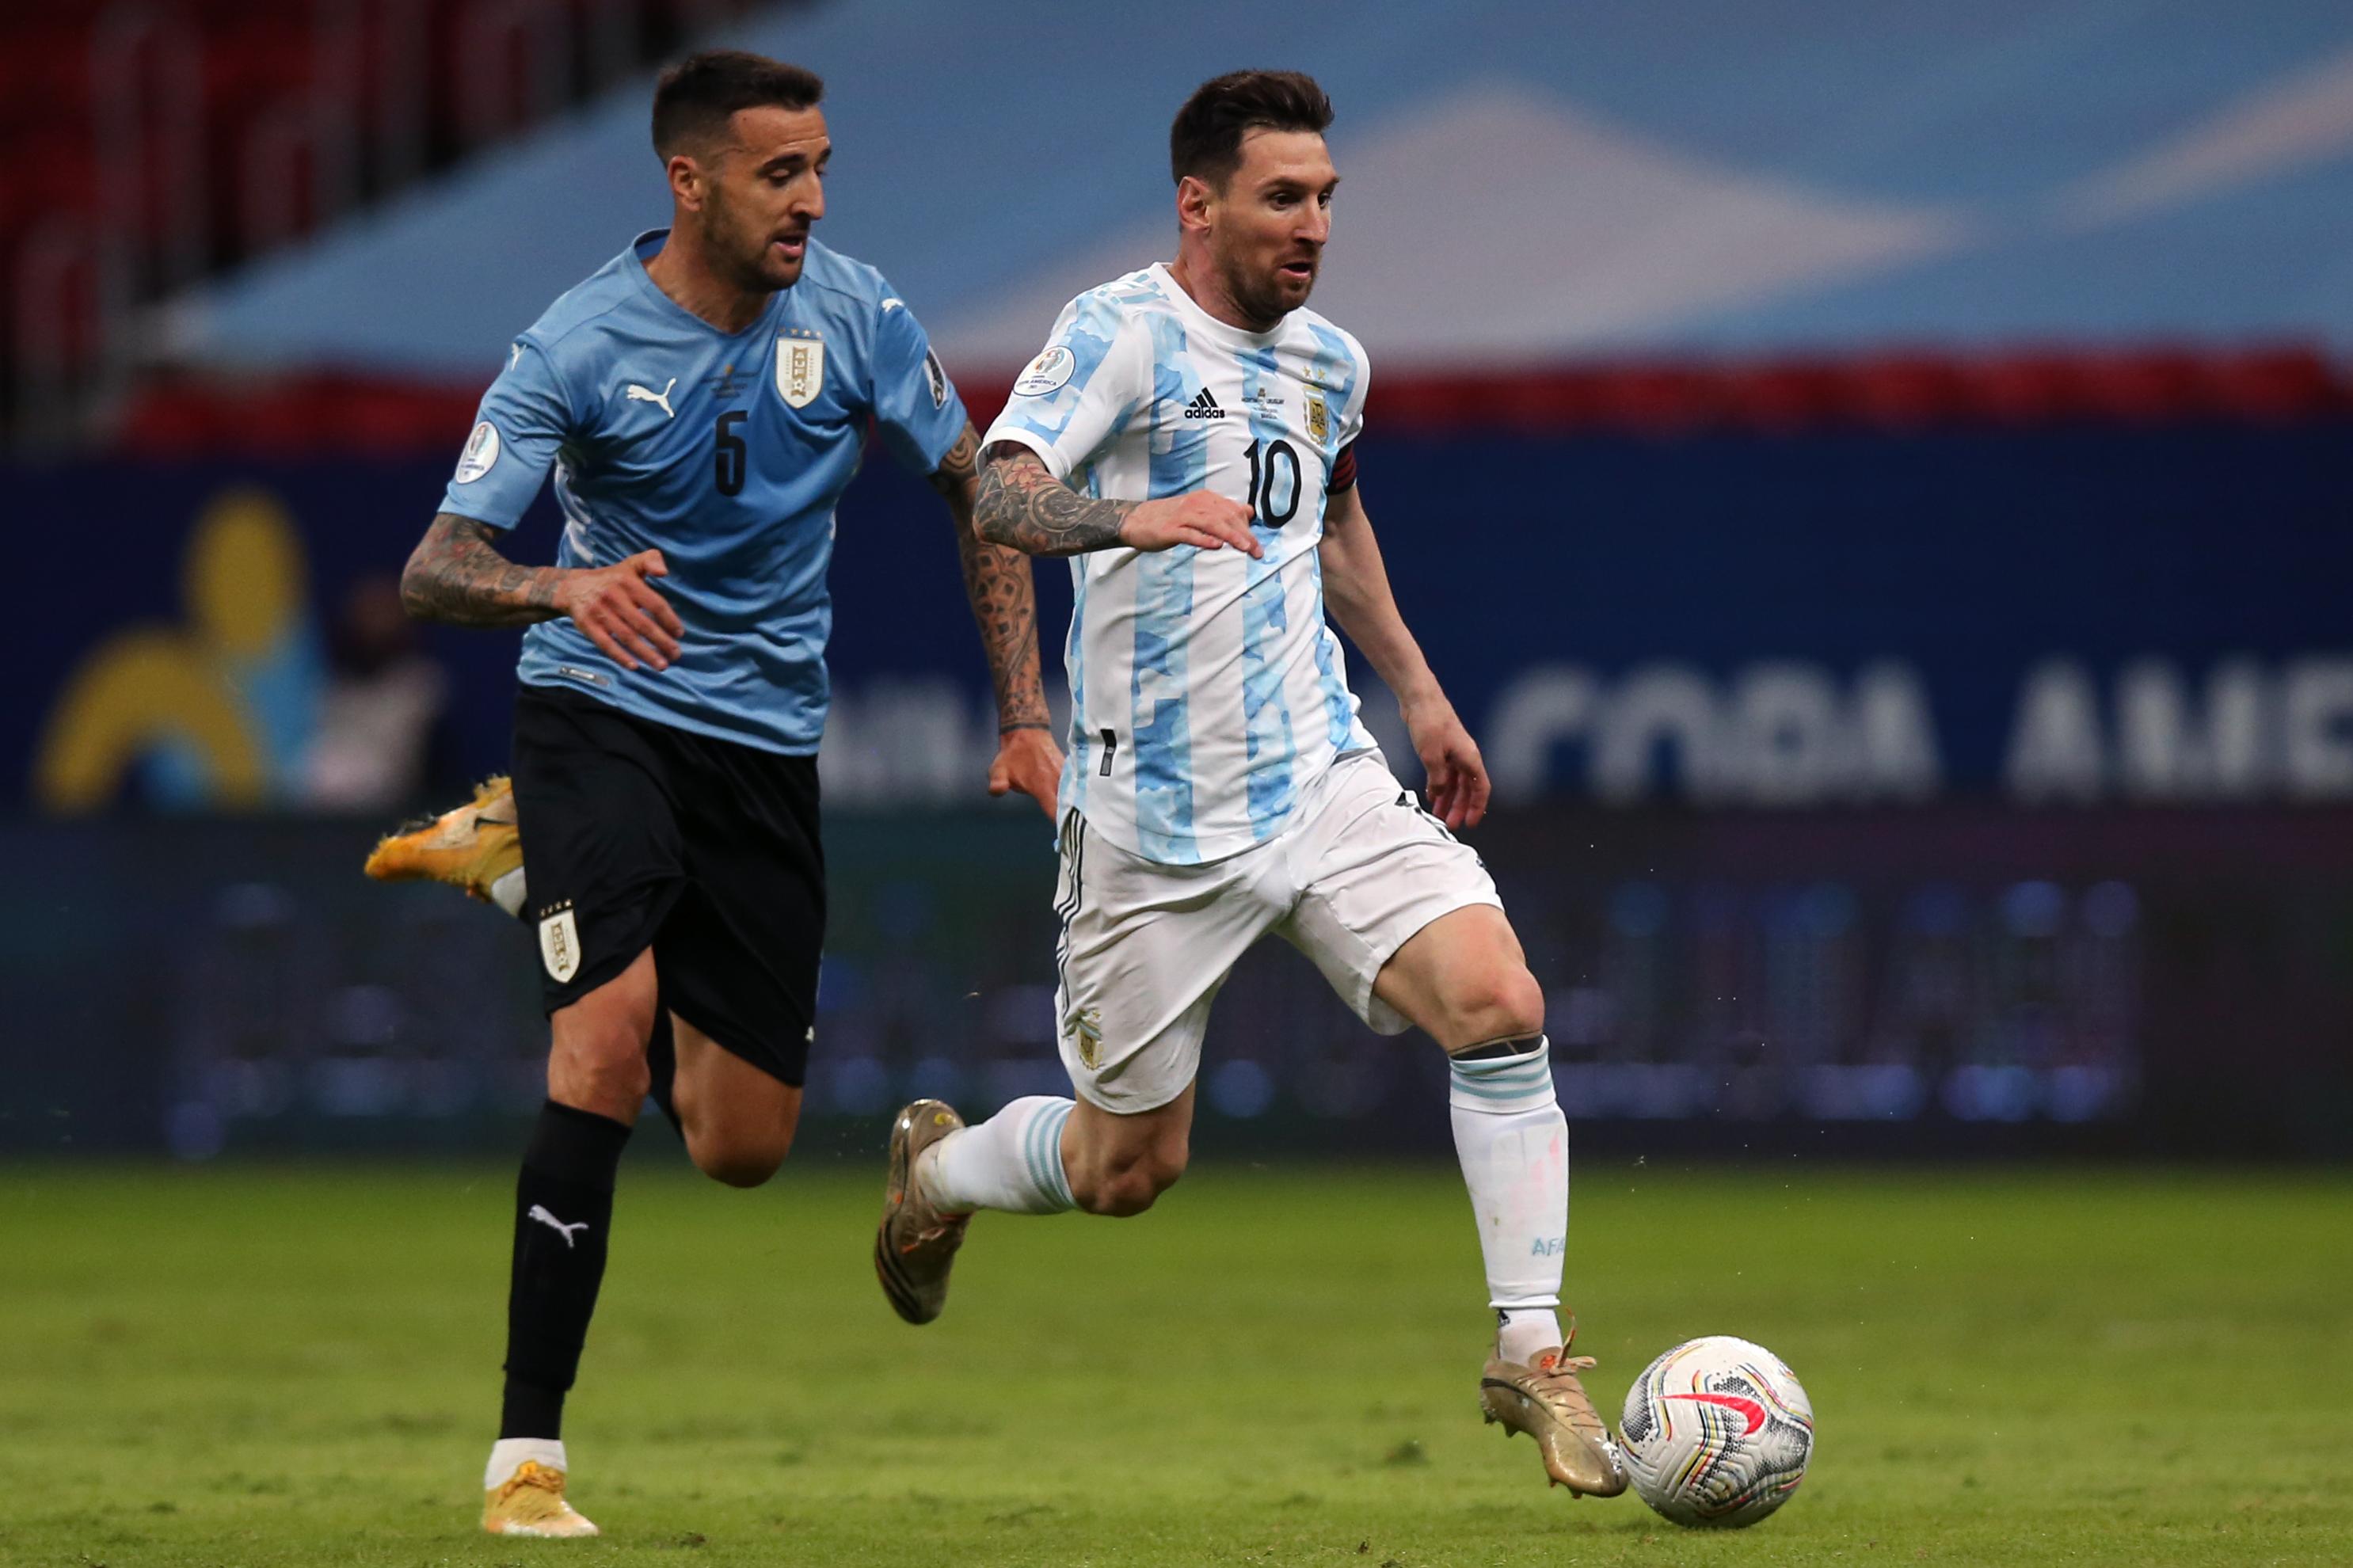 Watch: Lionel Messi's sublime assist against Uruguay